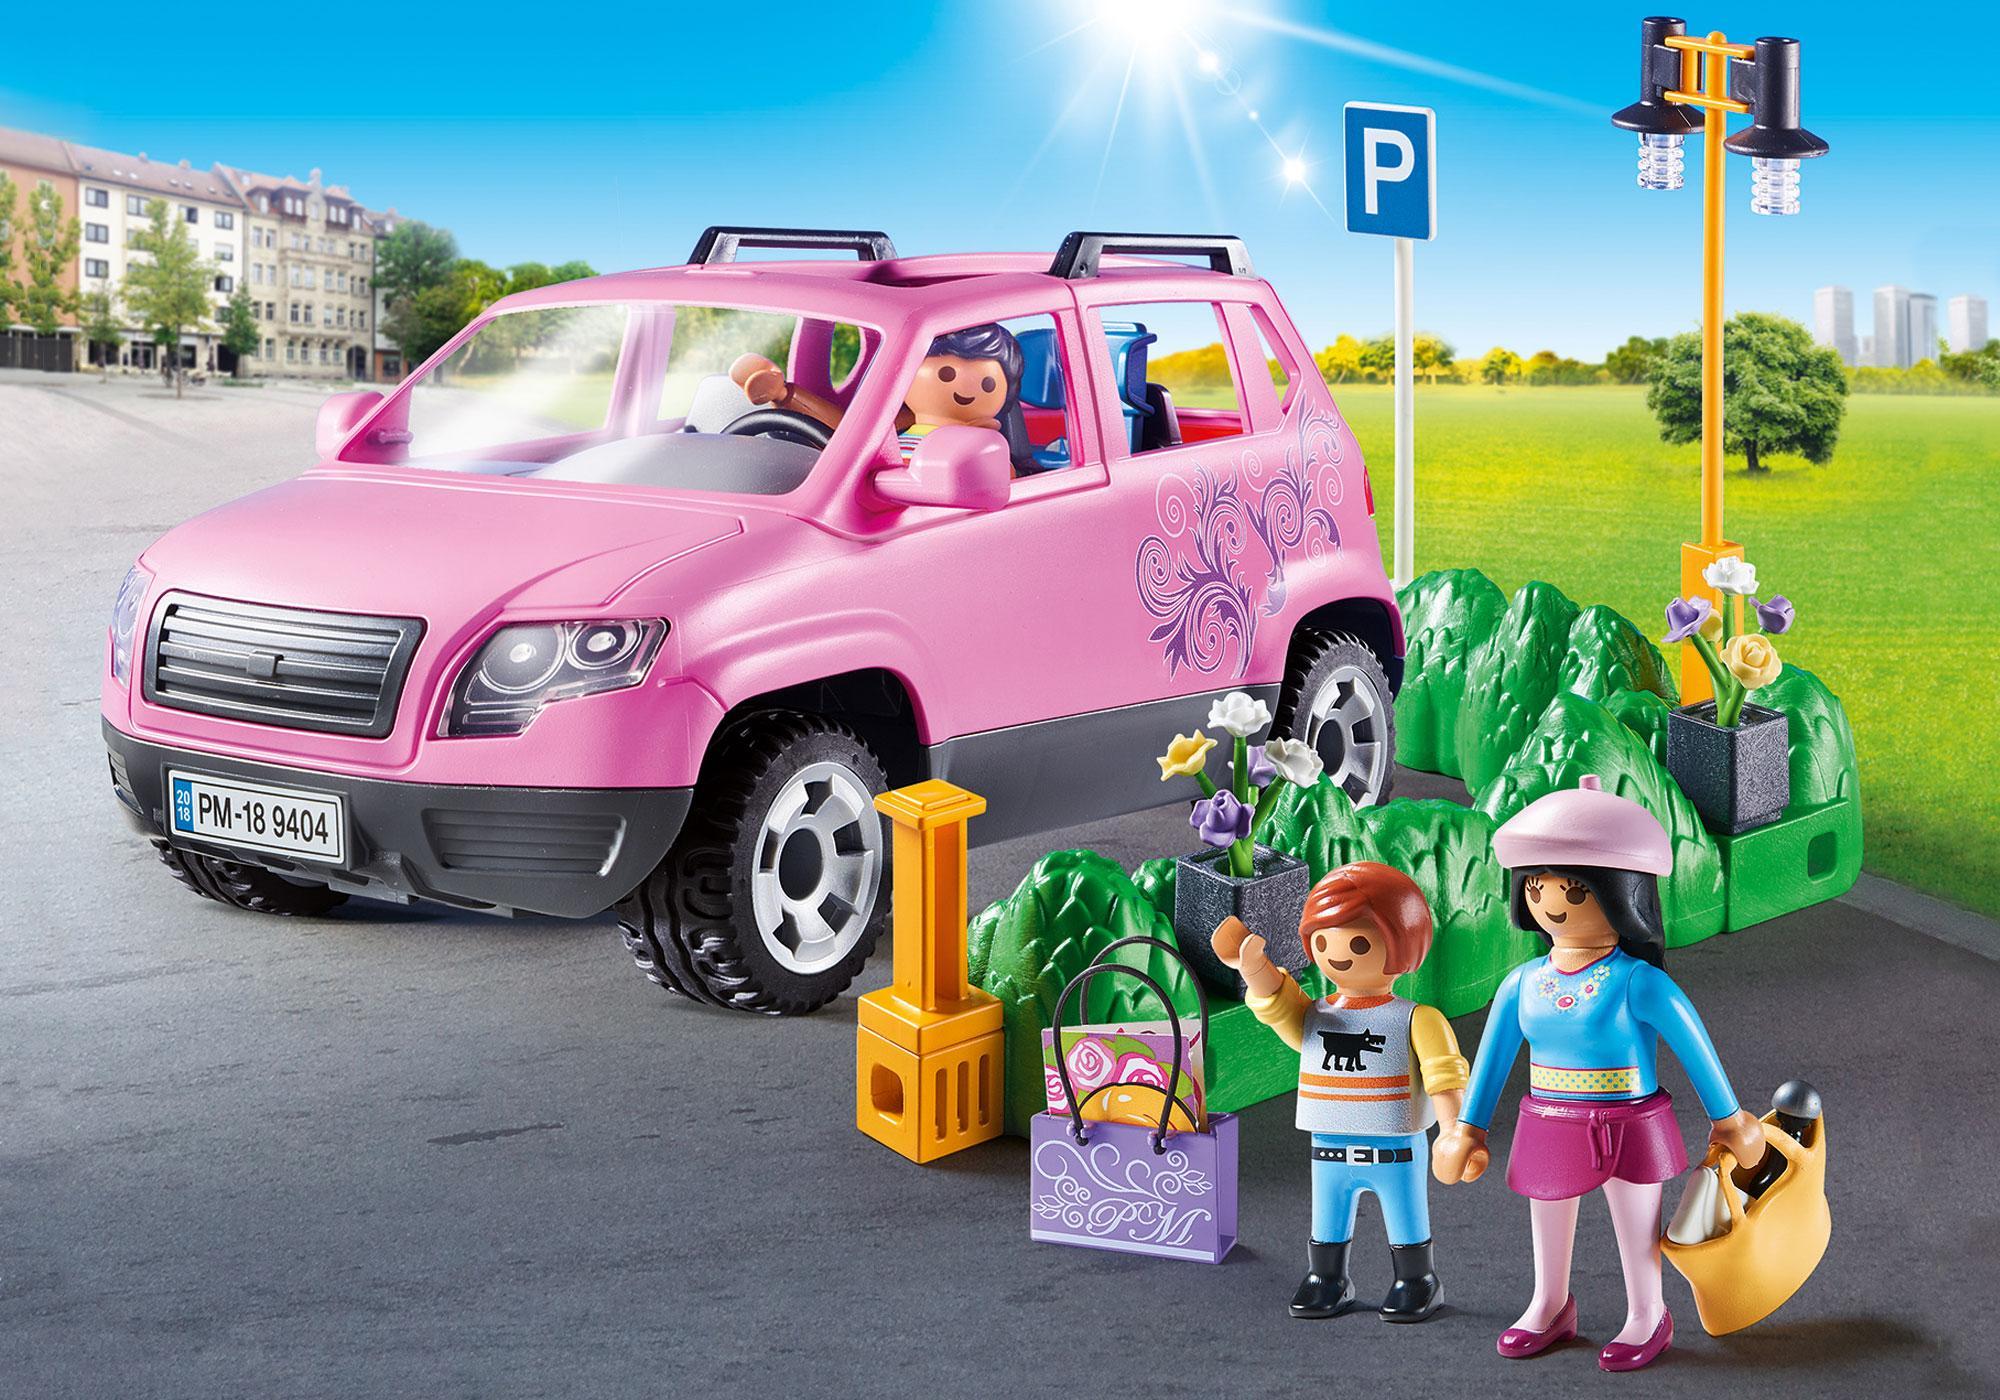 http://media.playmobil.com/i/playmobil/9404_product_detail/Familien-PKW mit Parkbucht